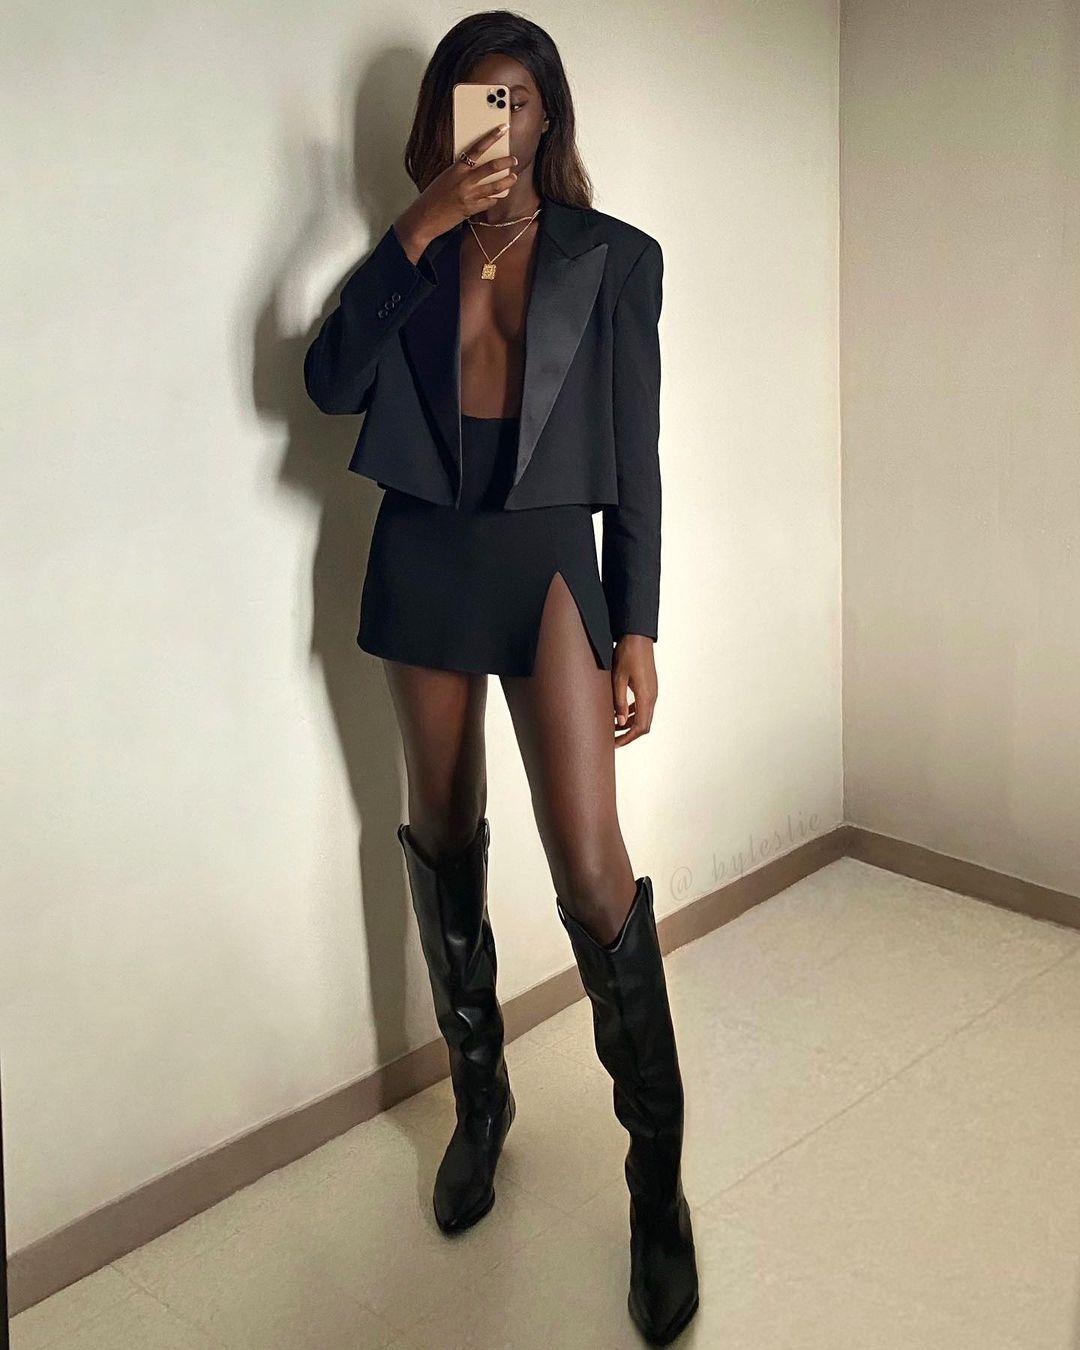 Mini skirt and black blazers